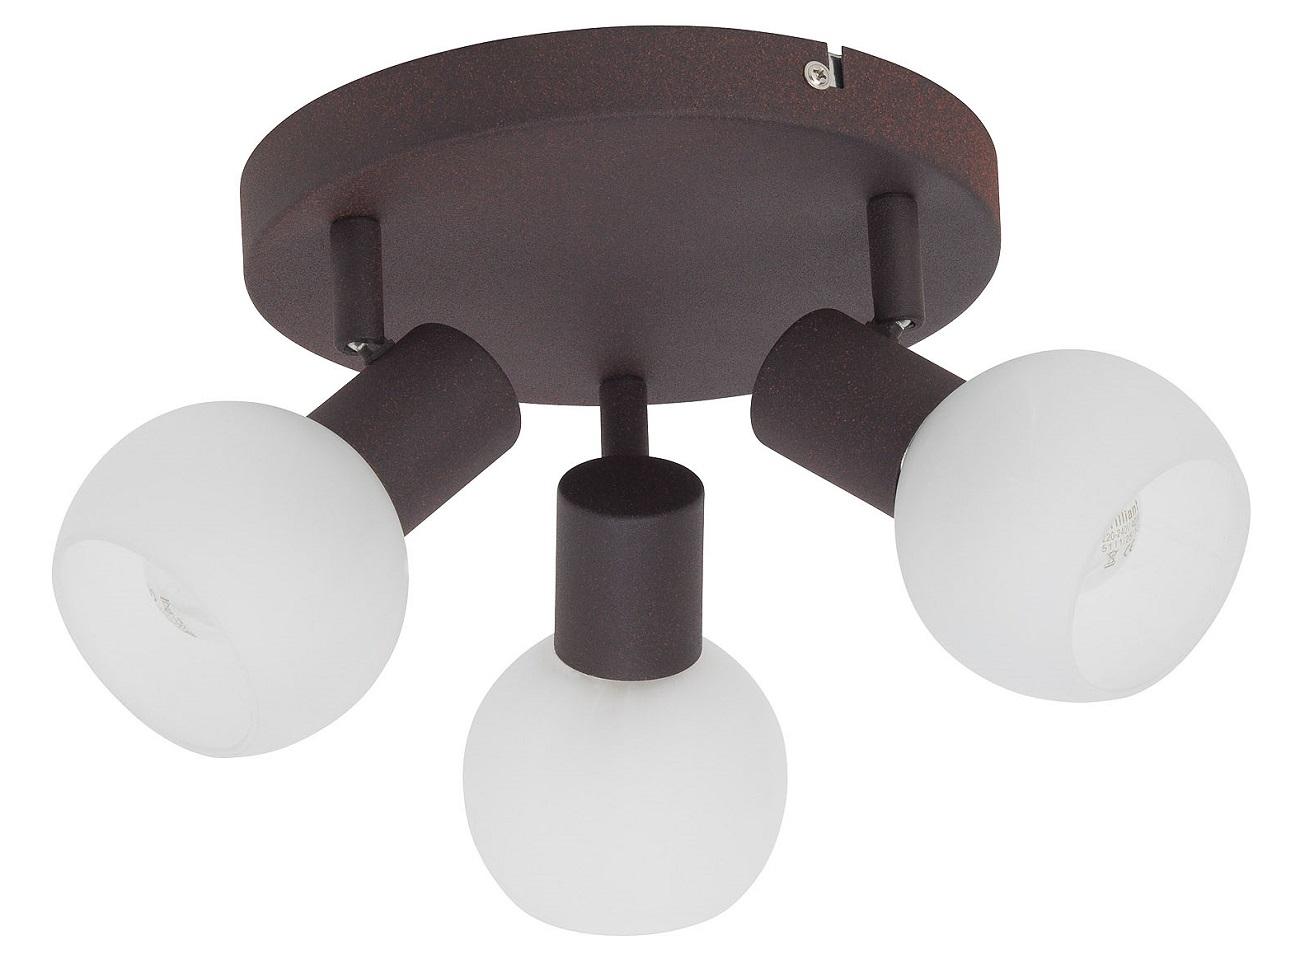 Plafondlamp Gobi 3xE14 max 40Watt in bruin met wit | Brilliant